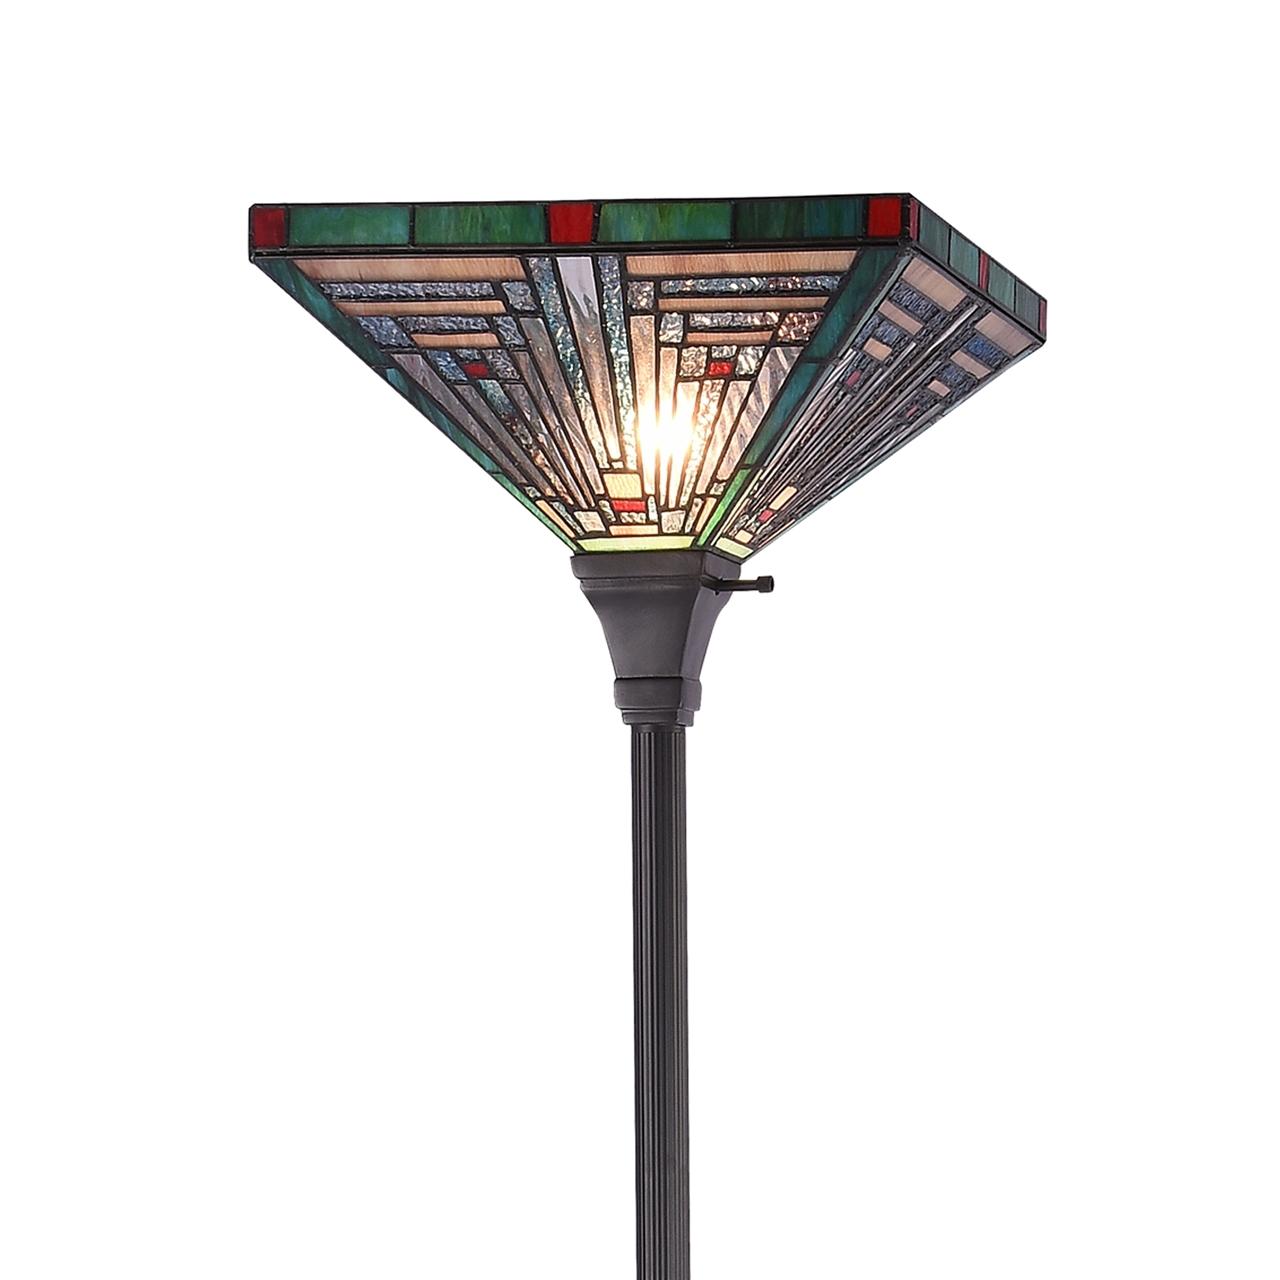 Chloe Lighting Inc Ch3t359bm14 Tf1 Torchiere Floor Lamp